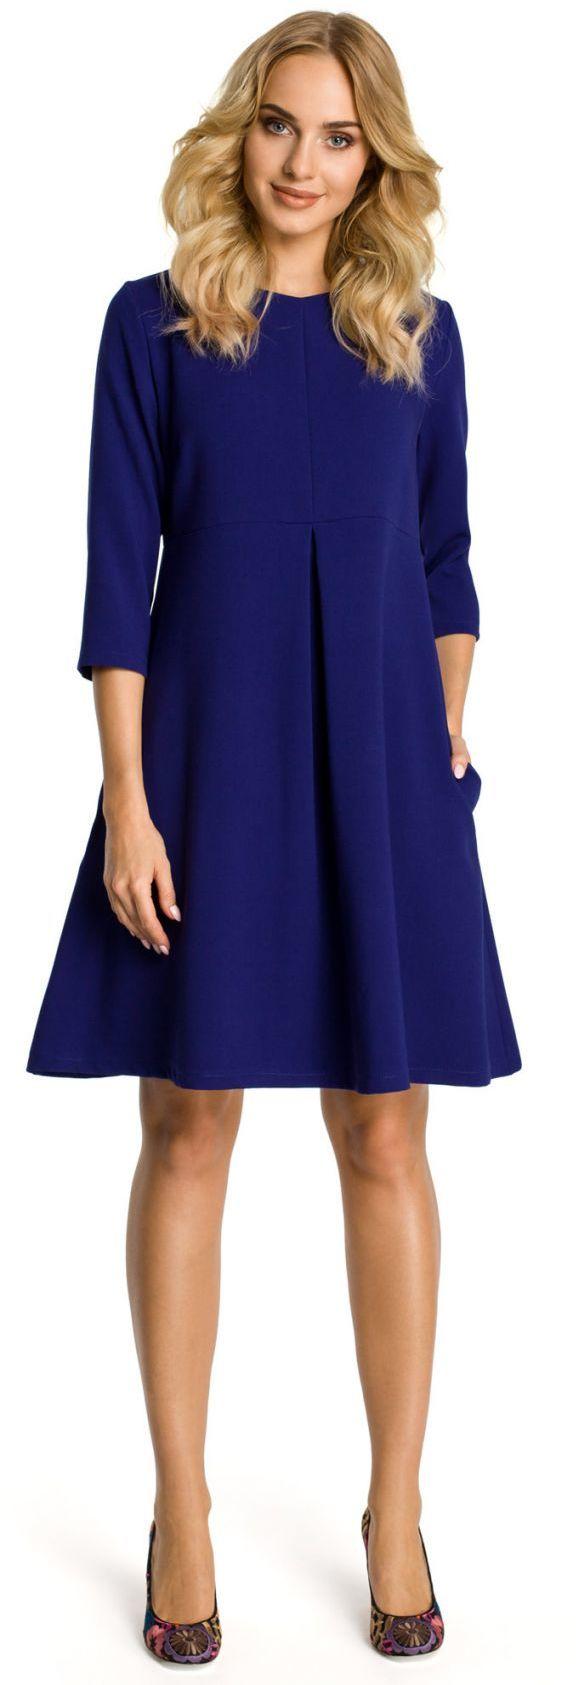 M338 sukienka chabrowa